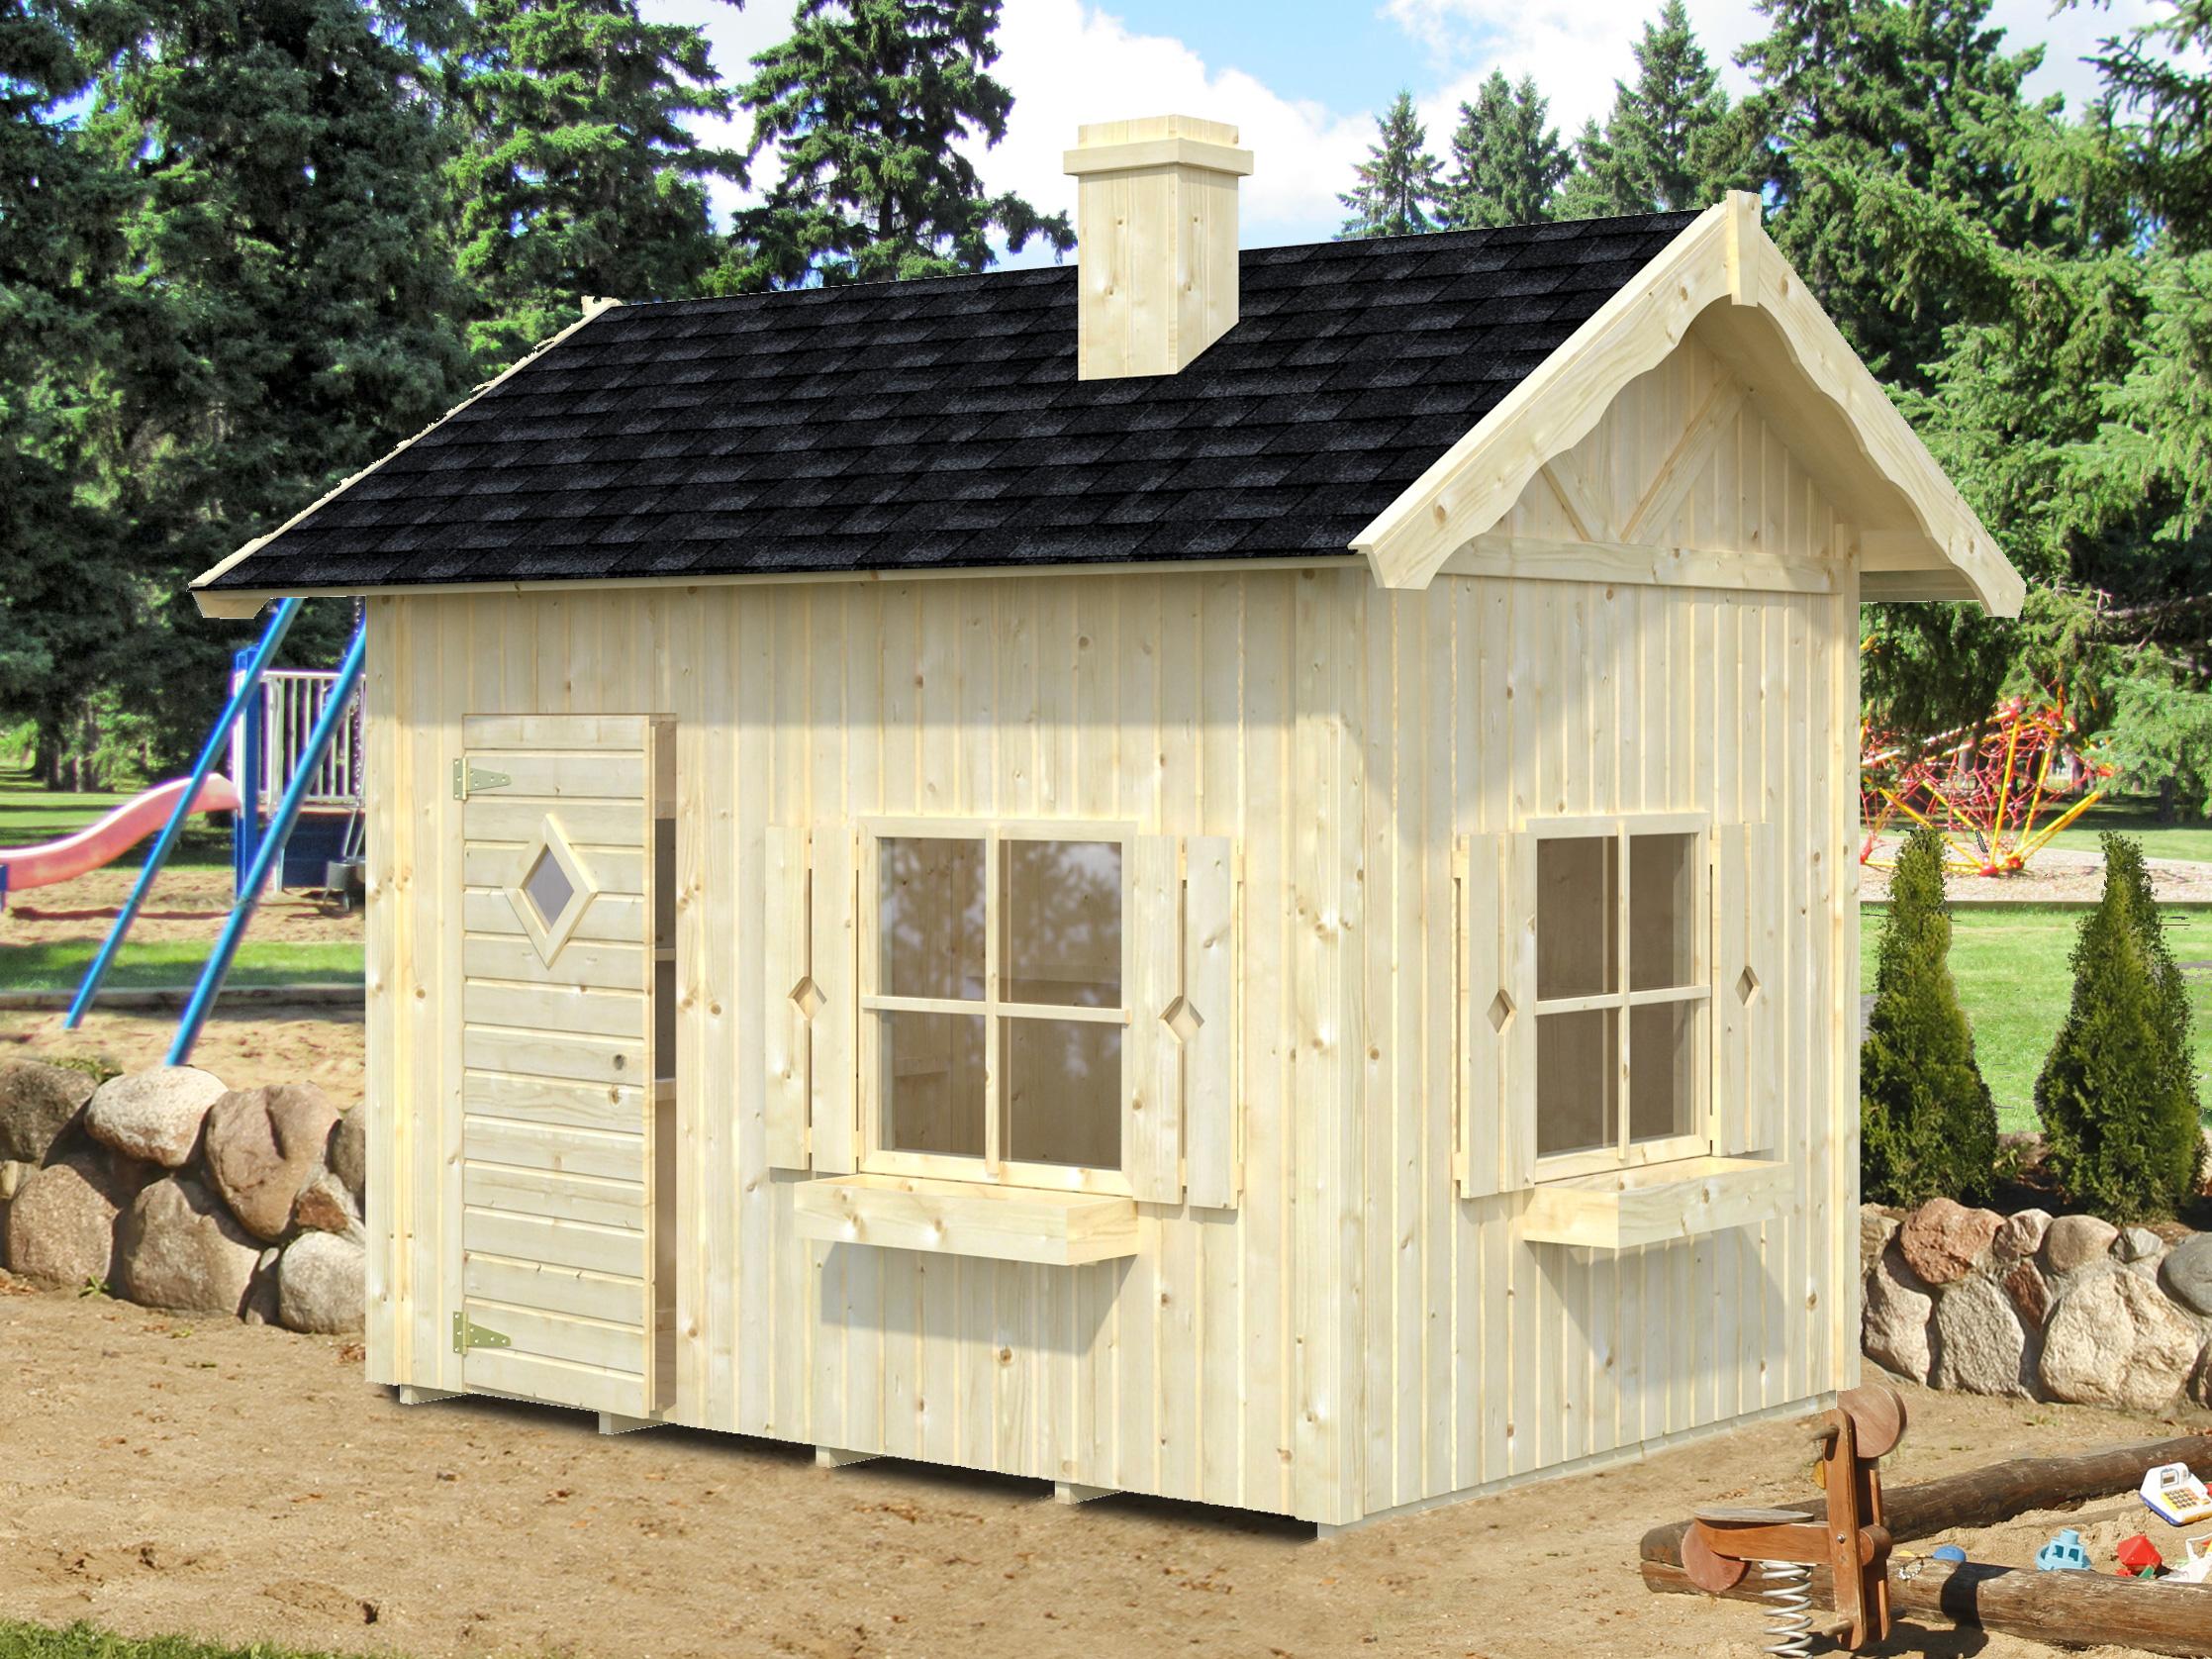 kinderspielhaus grete t v 16 mm ca 233x175 cm holzwurm obersayn. Black Bedroom Furniture Sets. Home Design Ideas